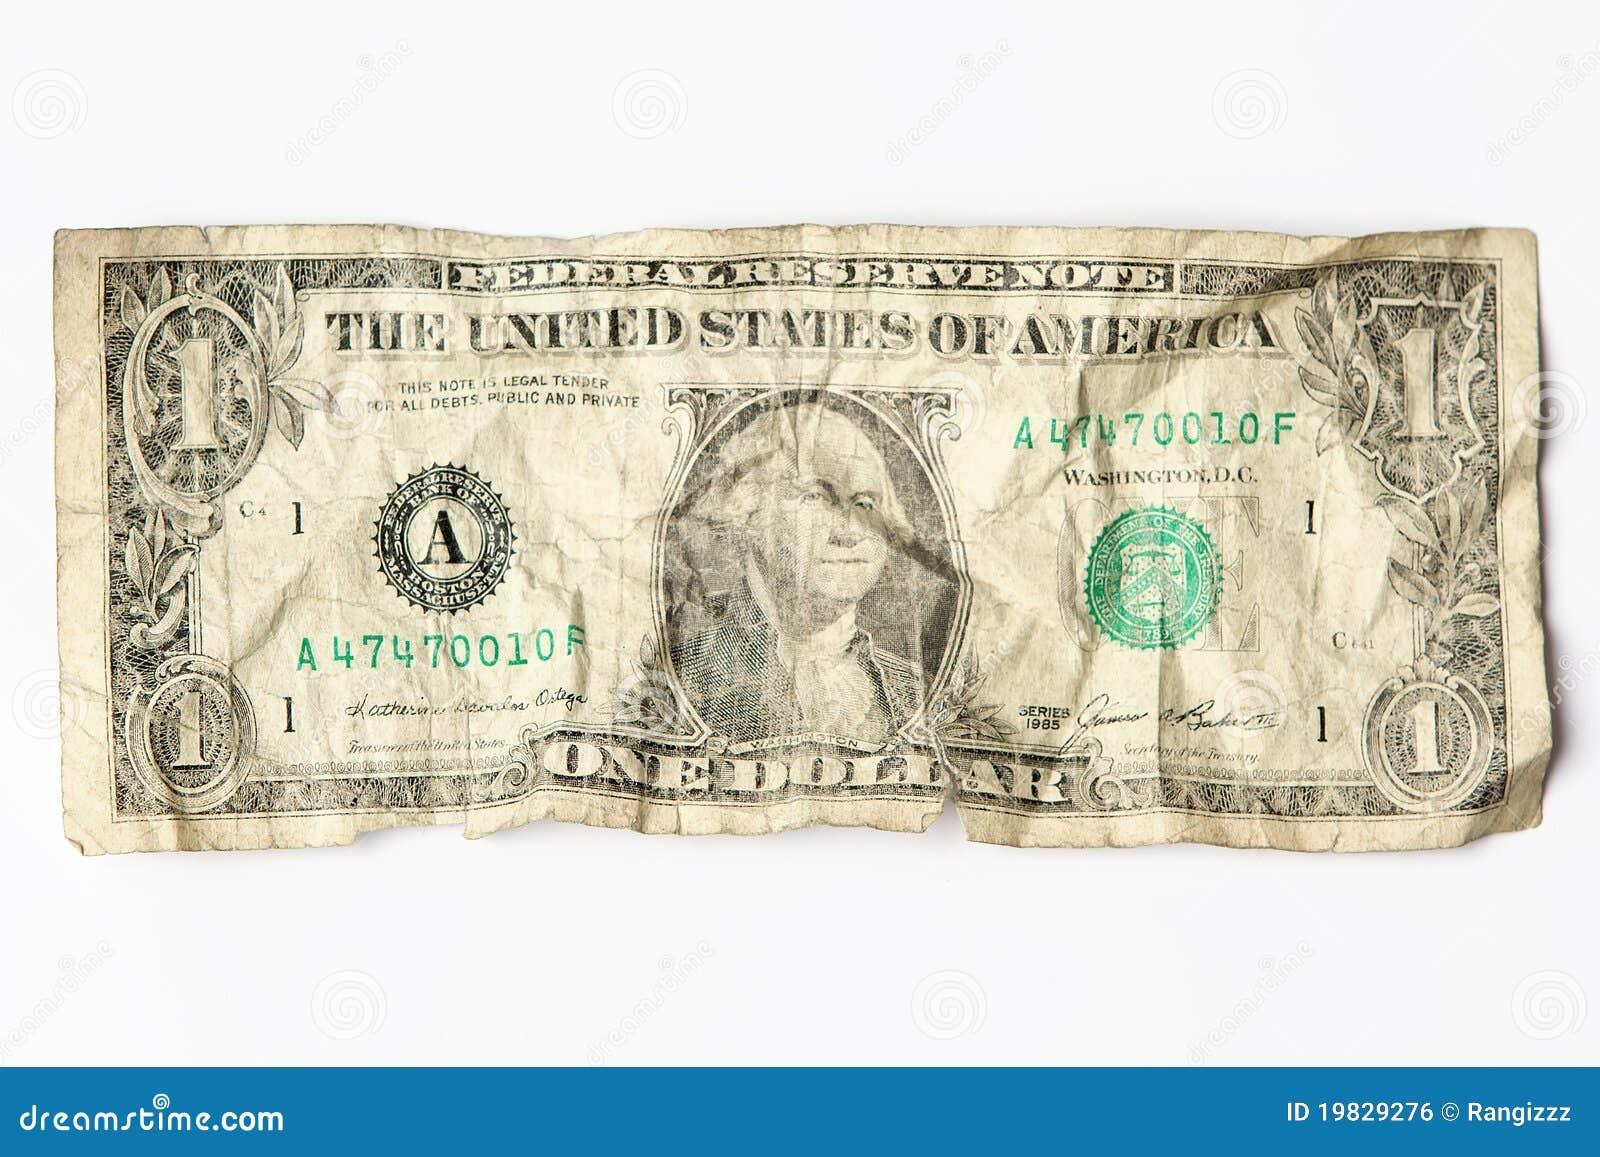 Old worn one dollar bill